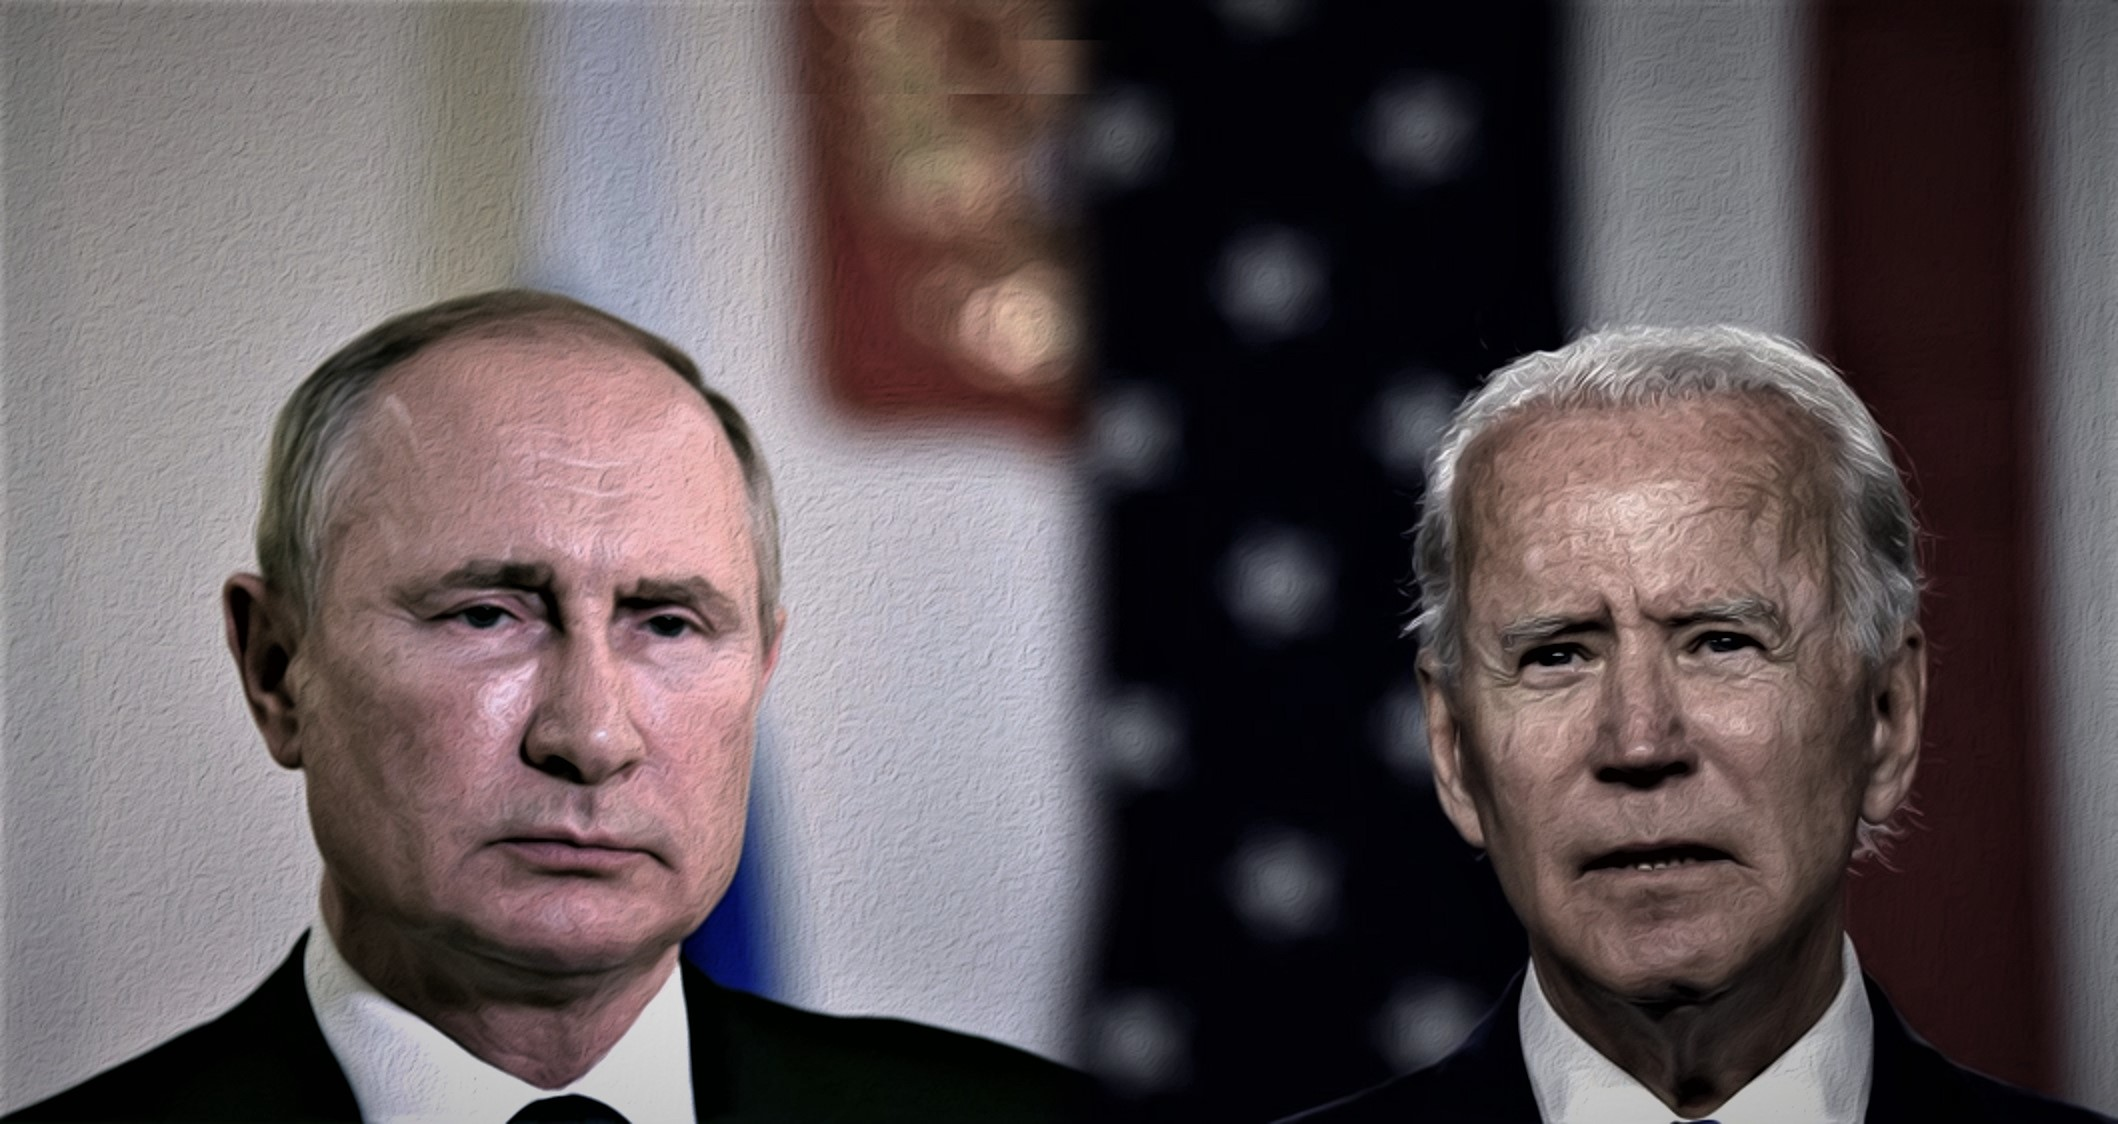 Putin Biden #политика featured, Владимир Путин, Грузия-Россия, Грузия-США, Джо Байден, украина